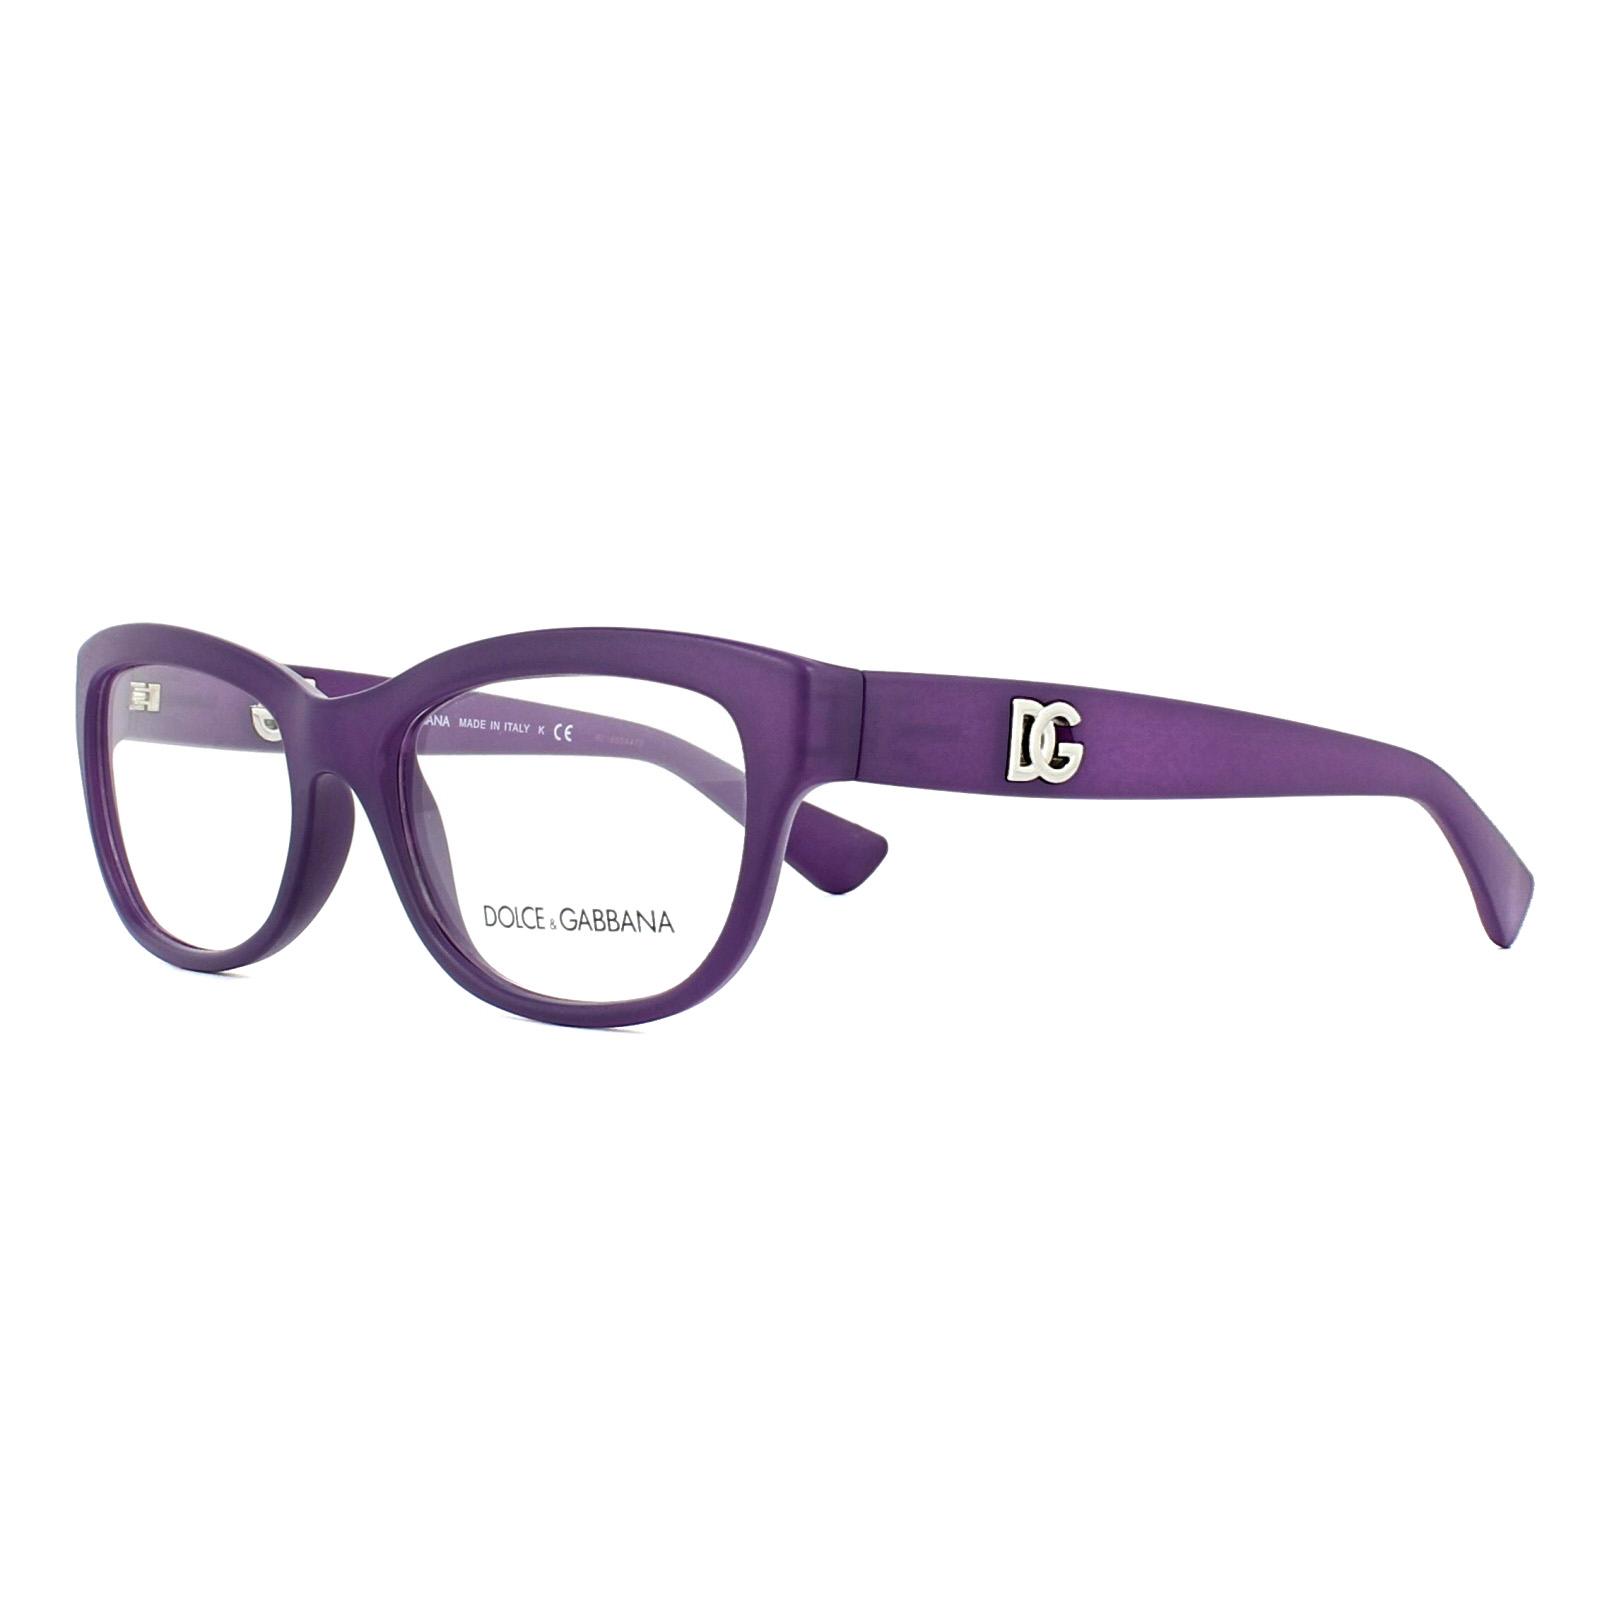 95e5a5c709 Details about Dolce   Gabbana Glasses Frames DG 5011 2677 Matt Opal Violet  54mm Womens